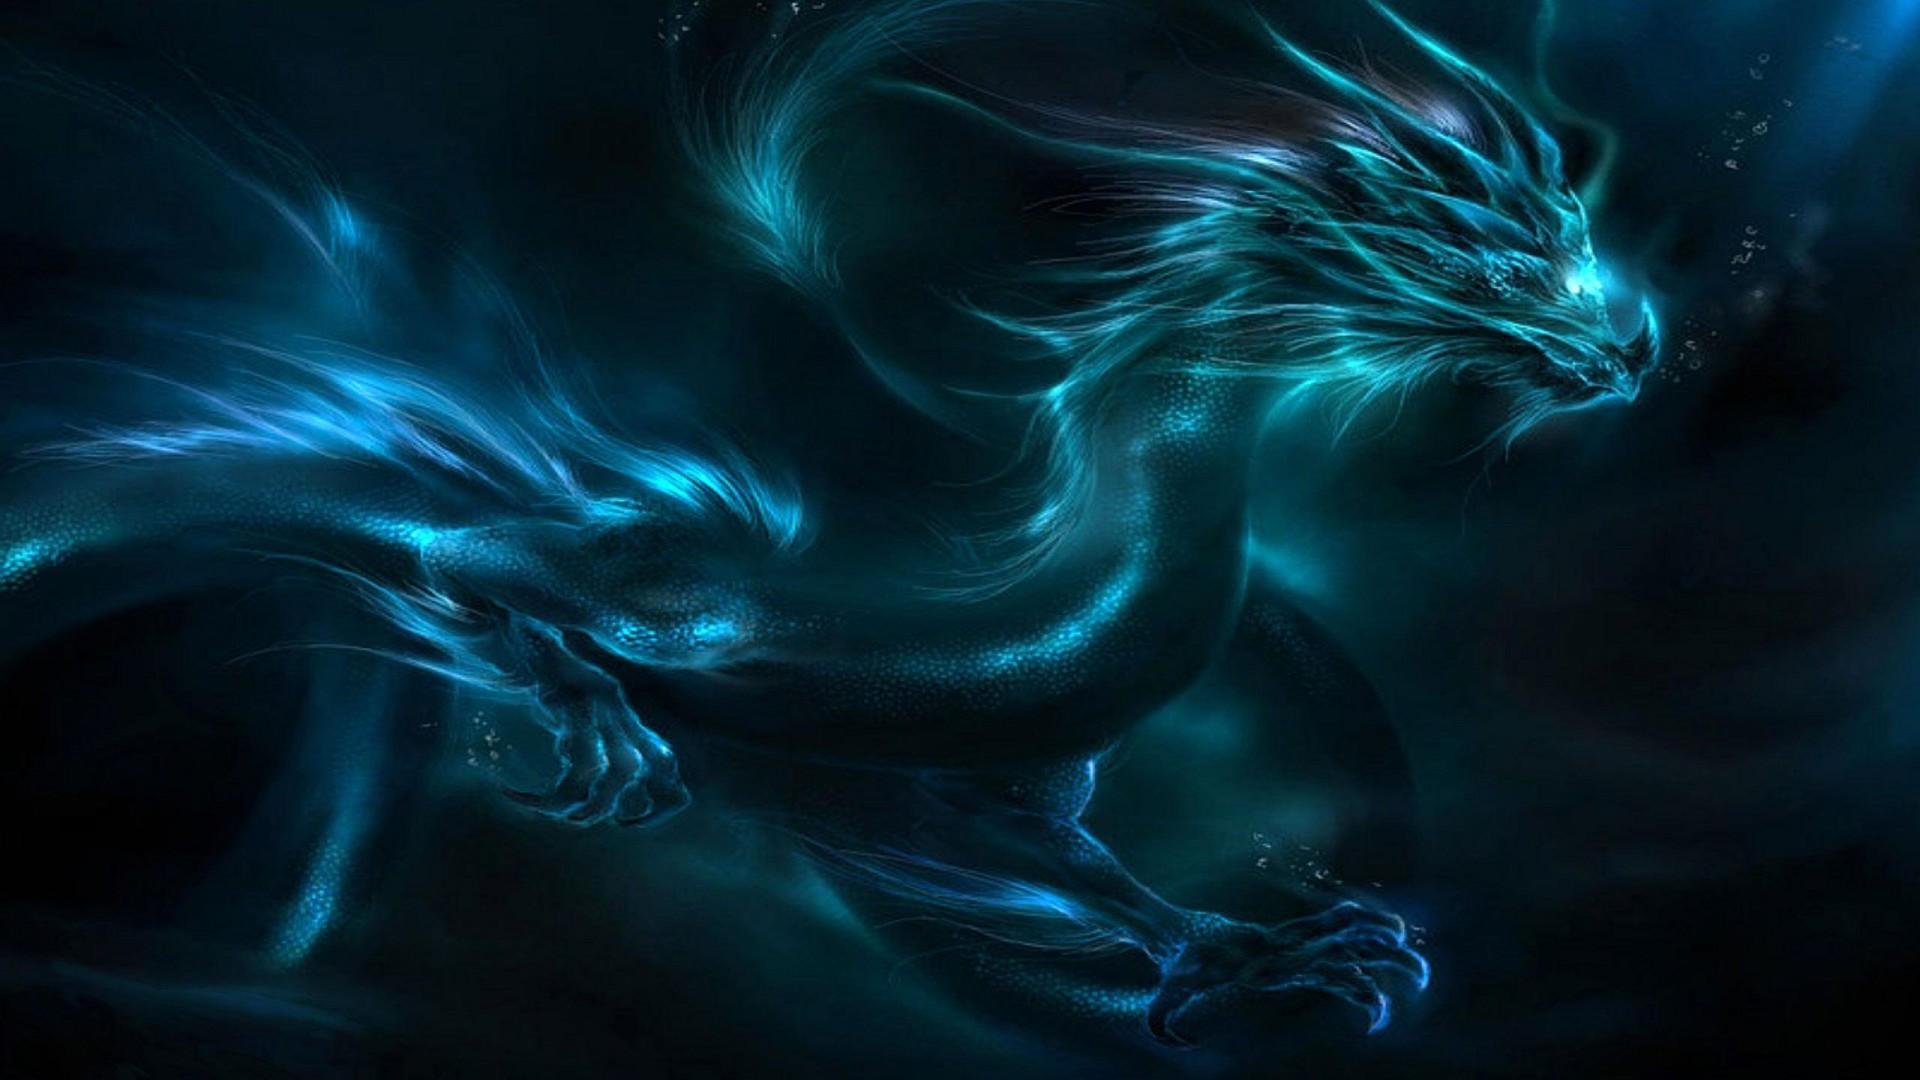 43+ Blue Dragon Wallpaper HD on WallpaperSafari